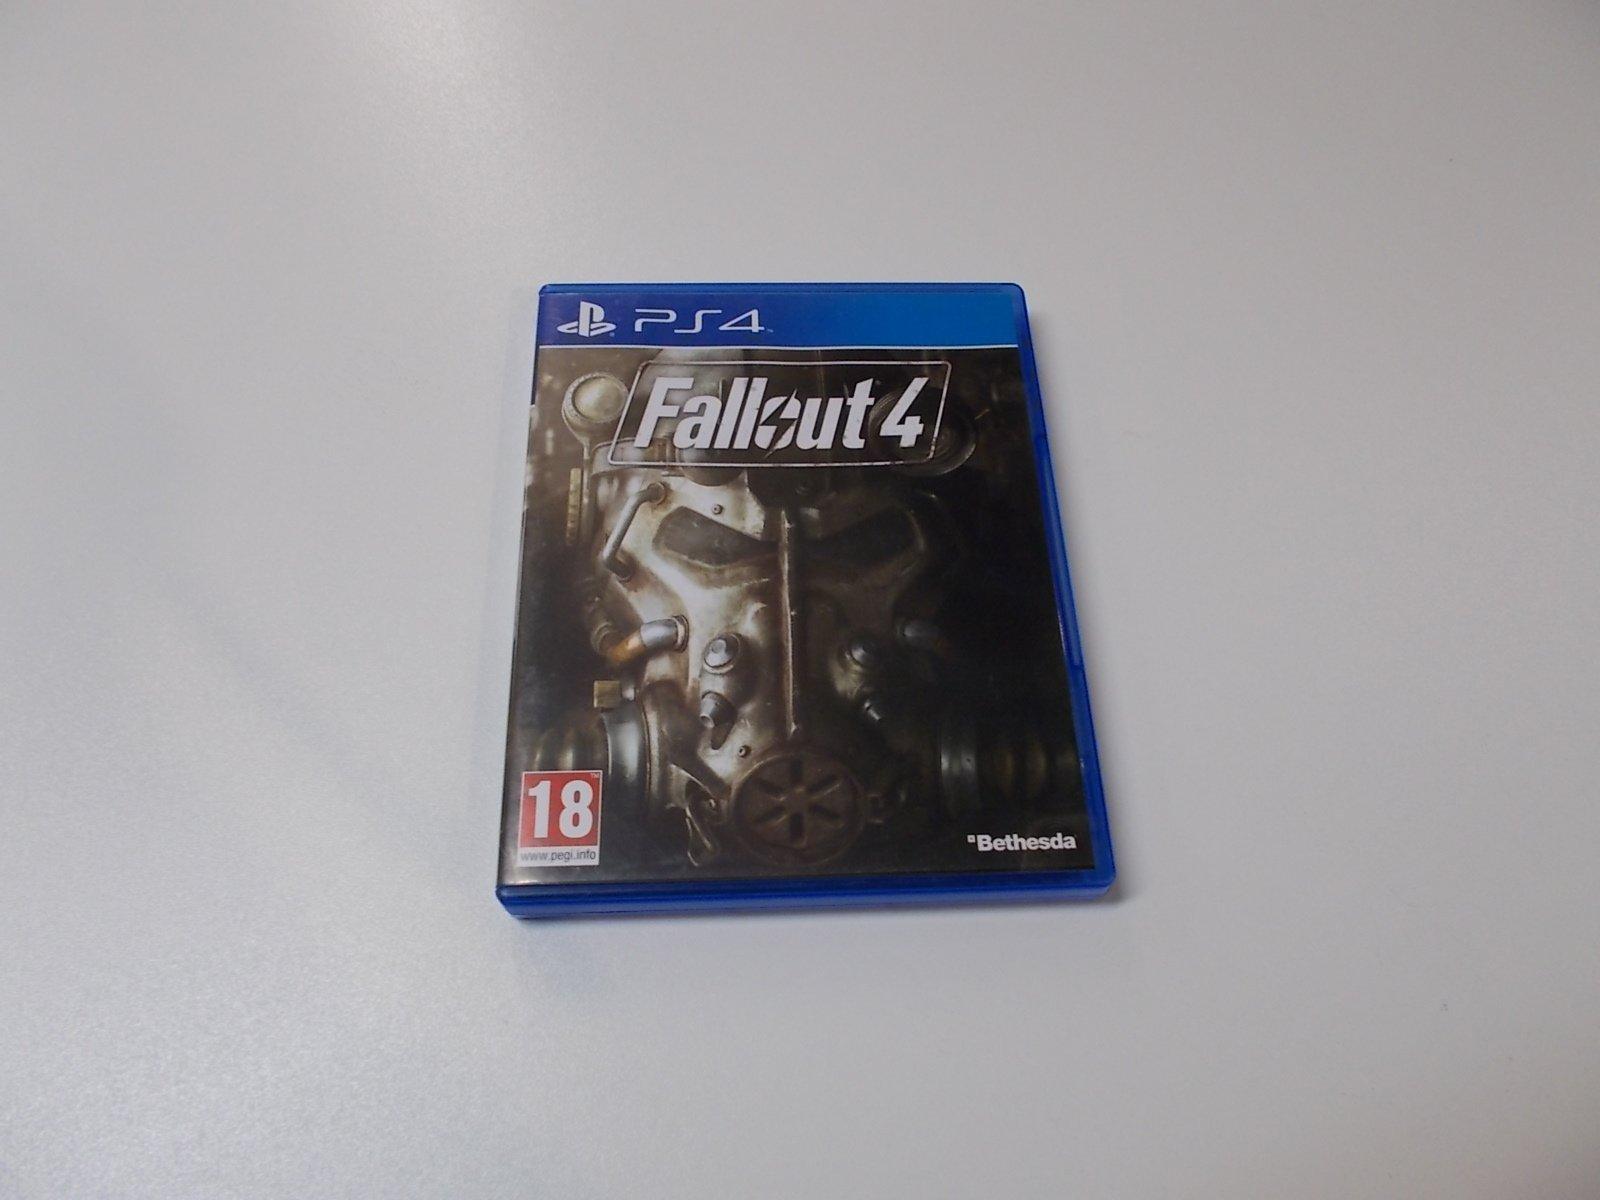 Fallout 4 - GRA Ps4 - Opole 0481